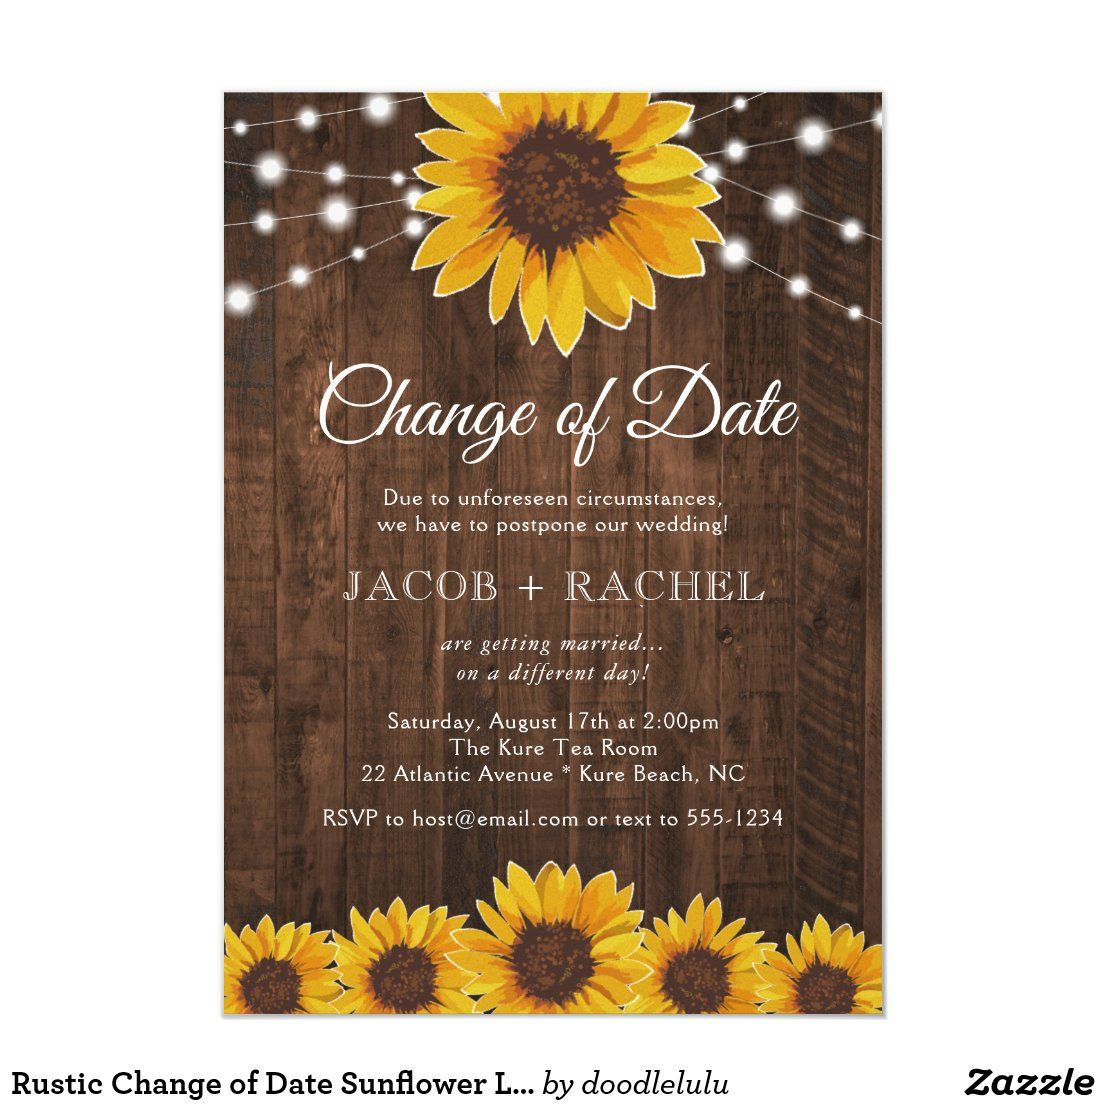 Rustic Change of Date Sunflower Lights Wedding Invitation